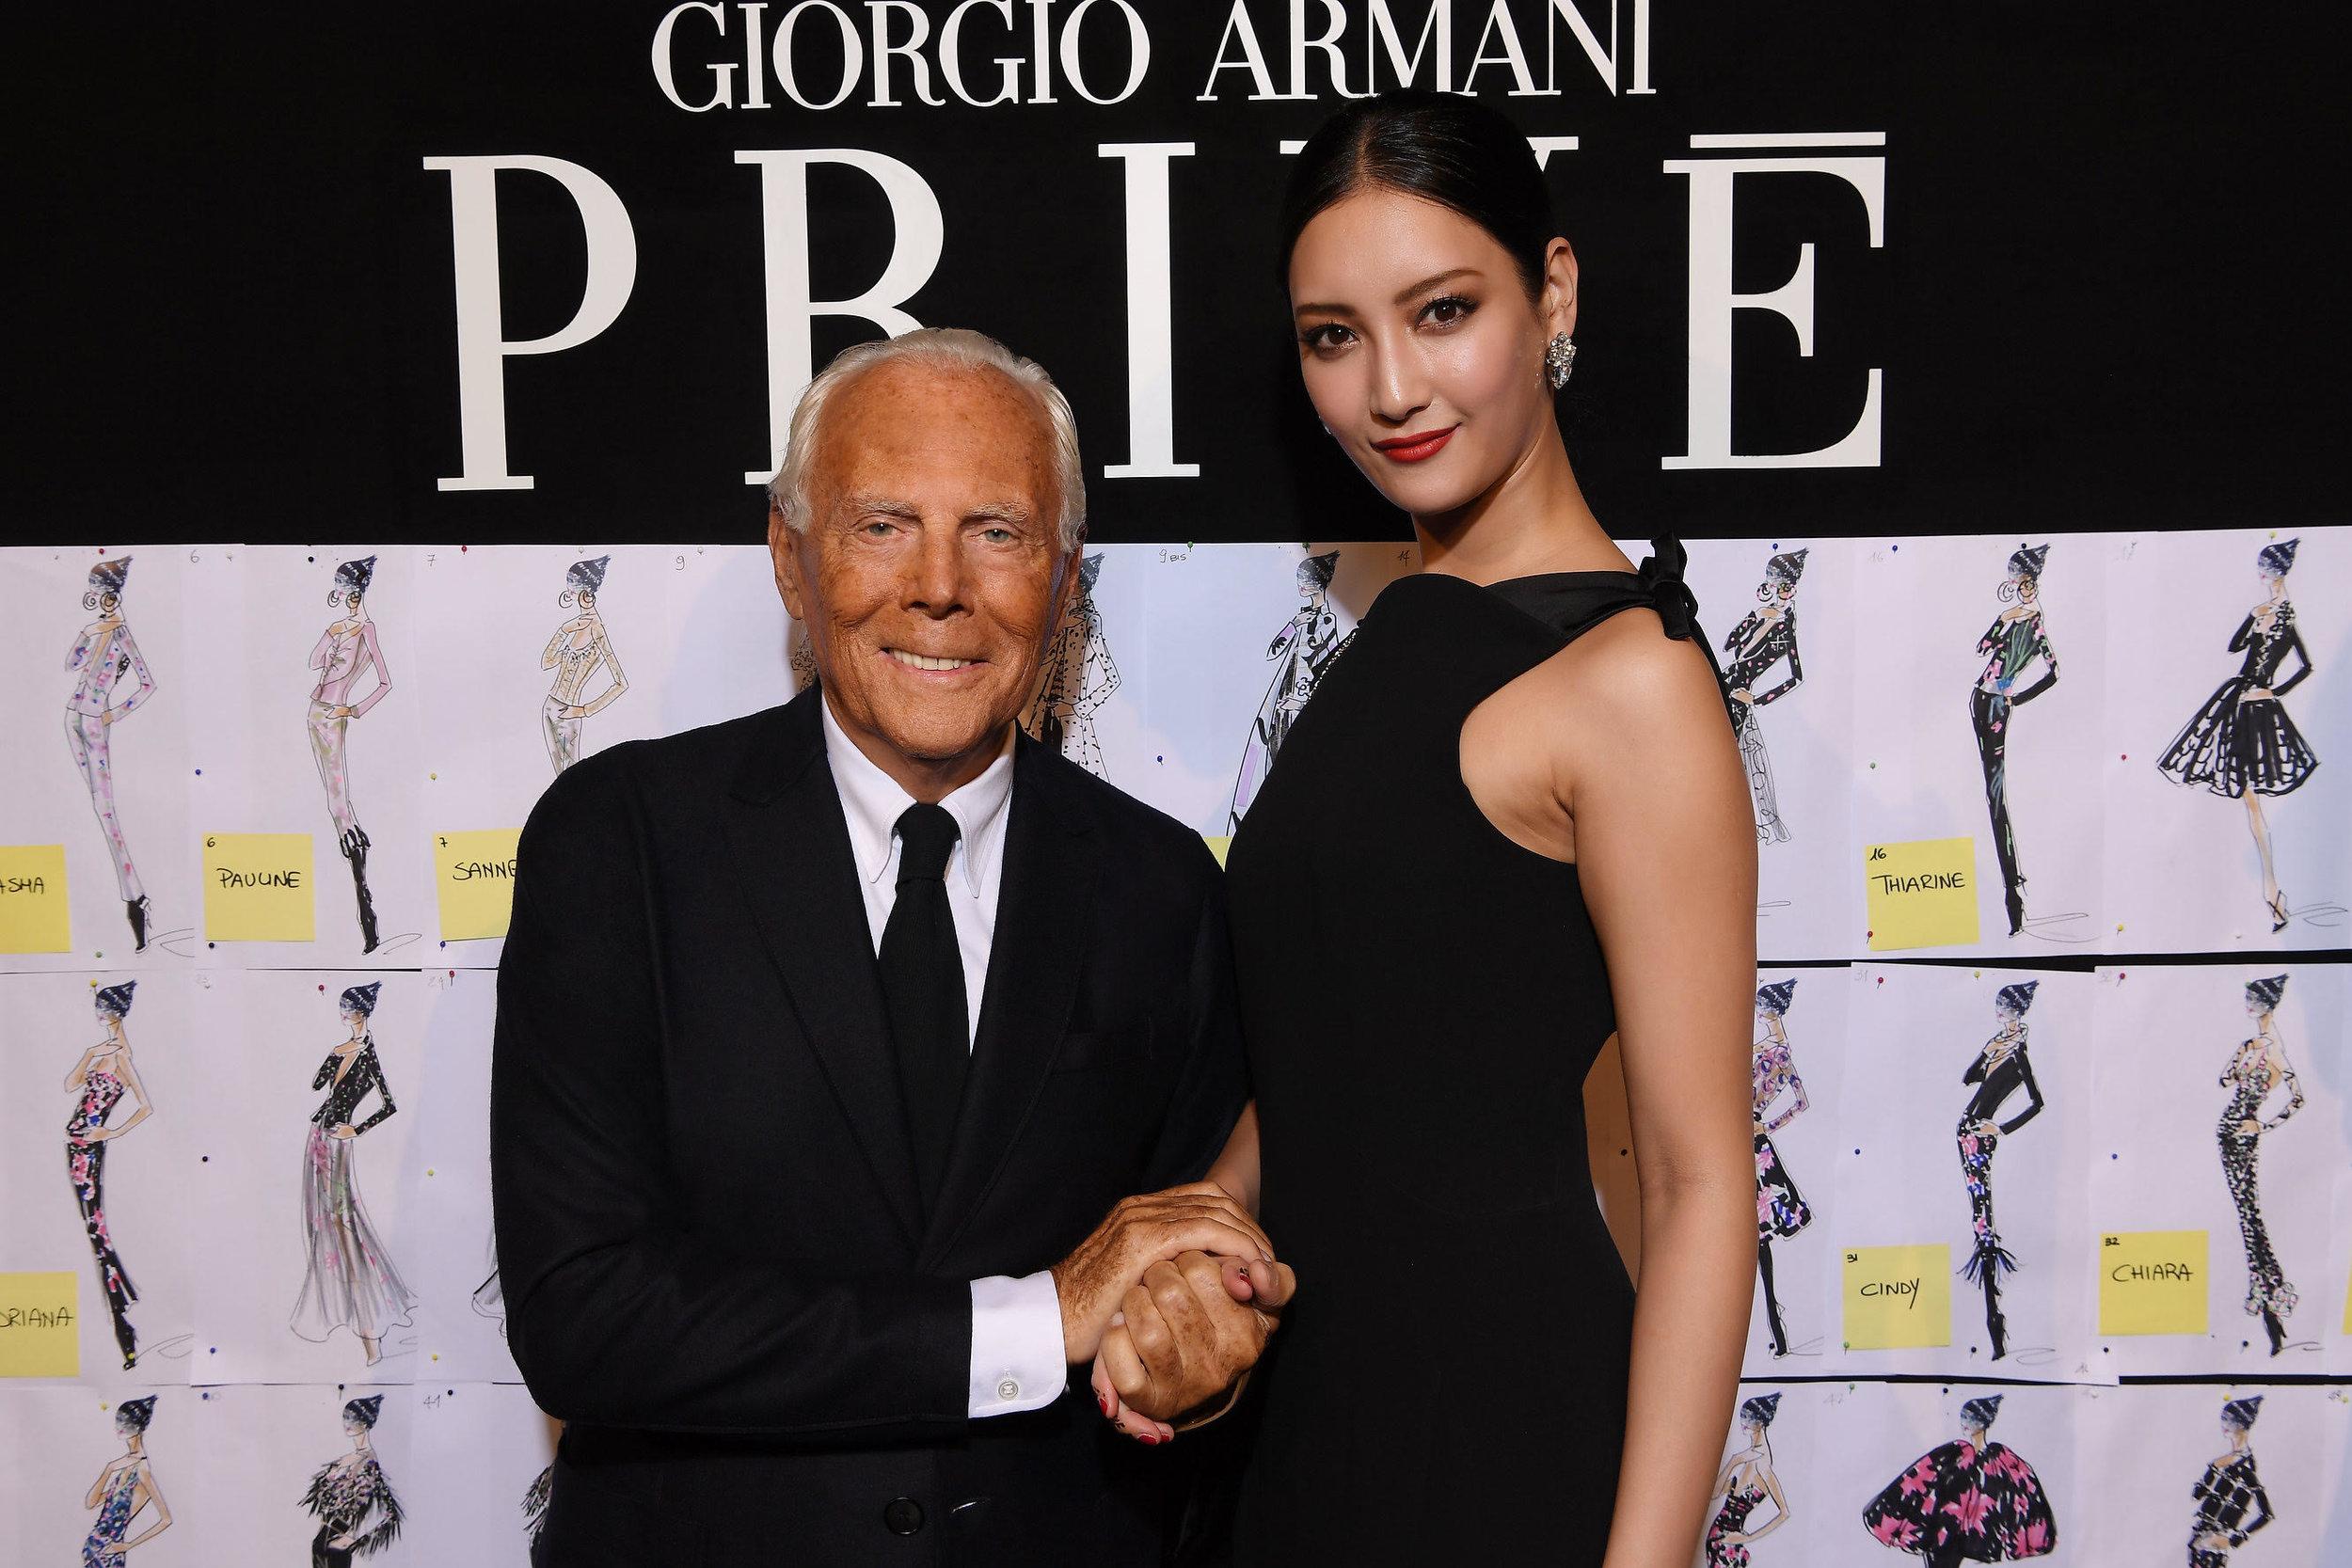 Nanao for Giorgio Armani Beauty